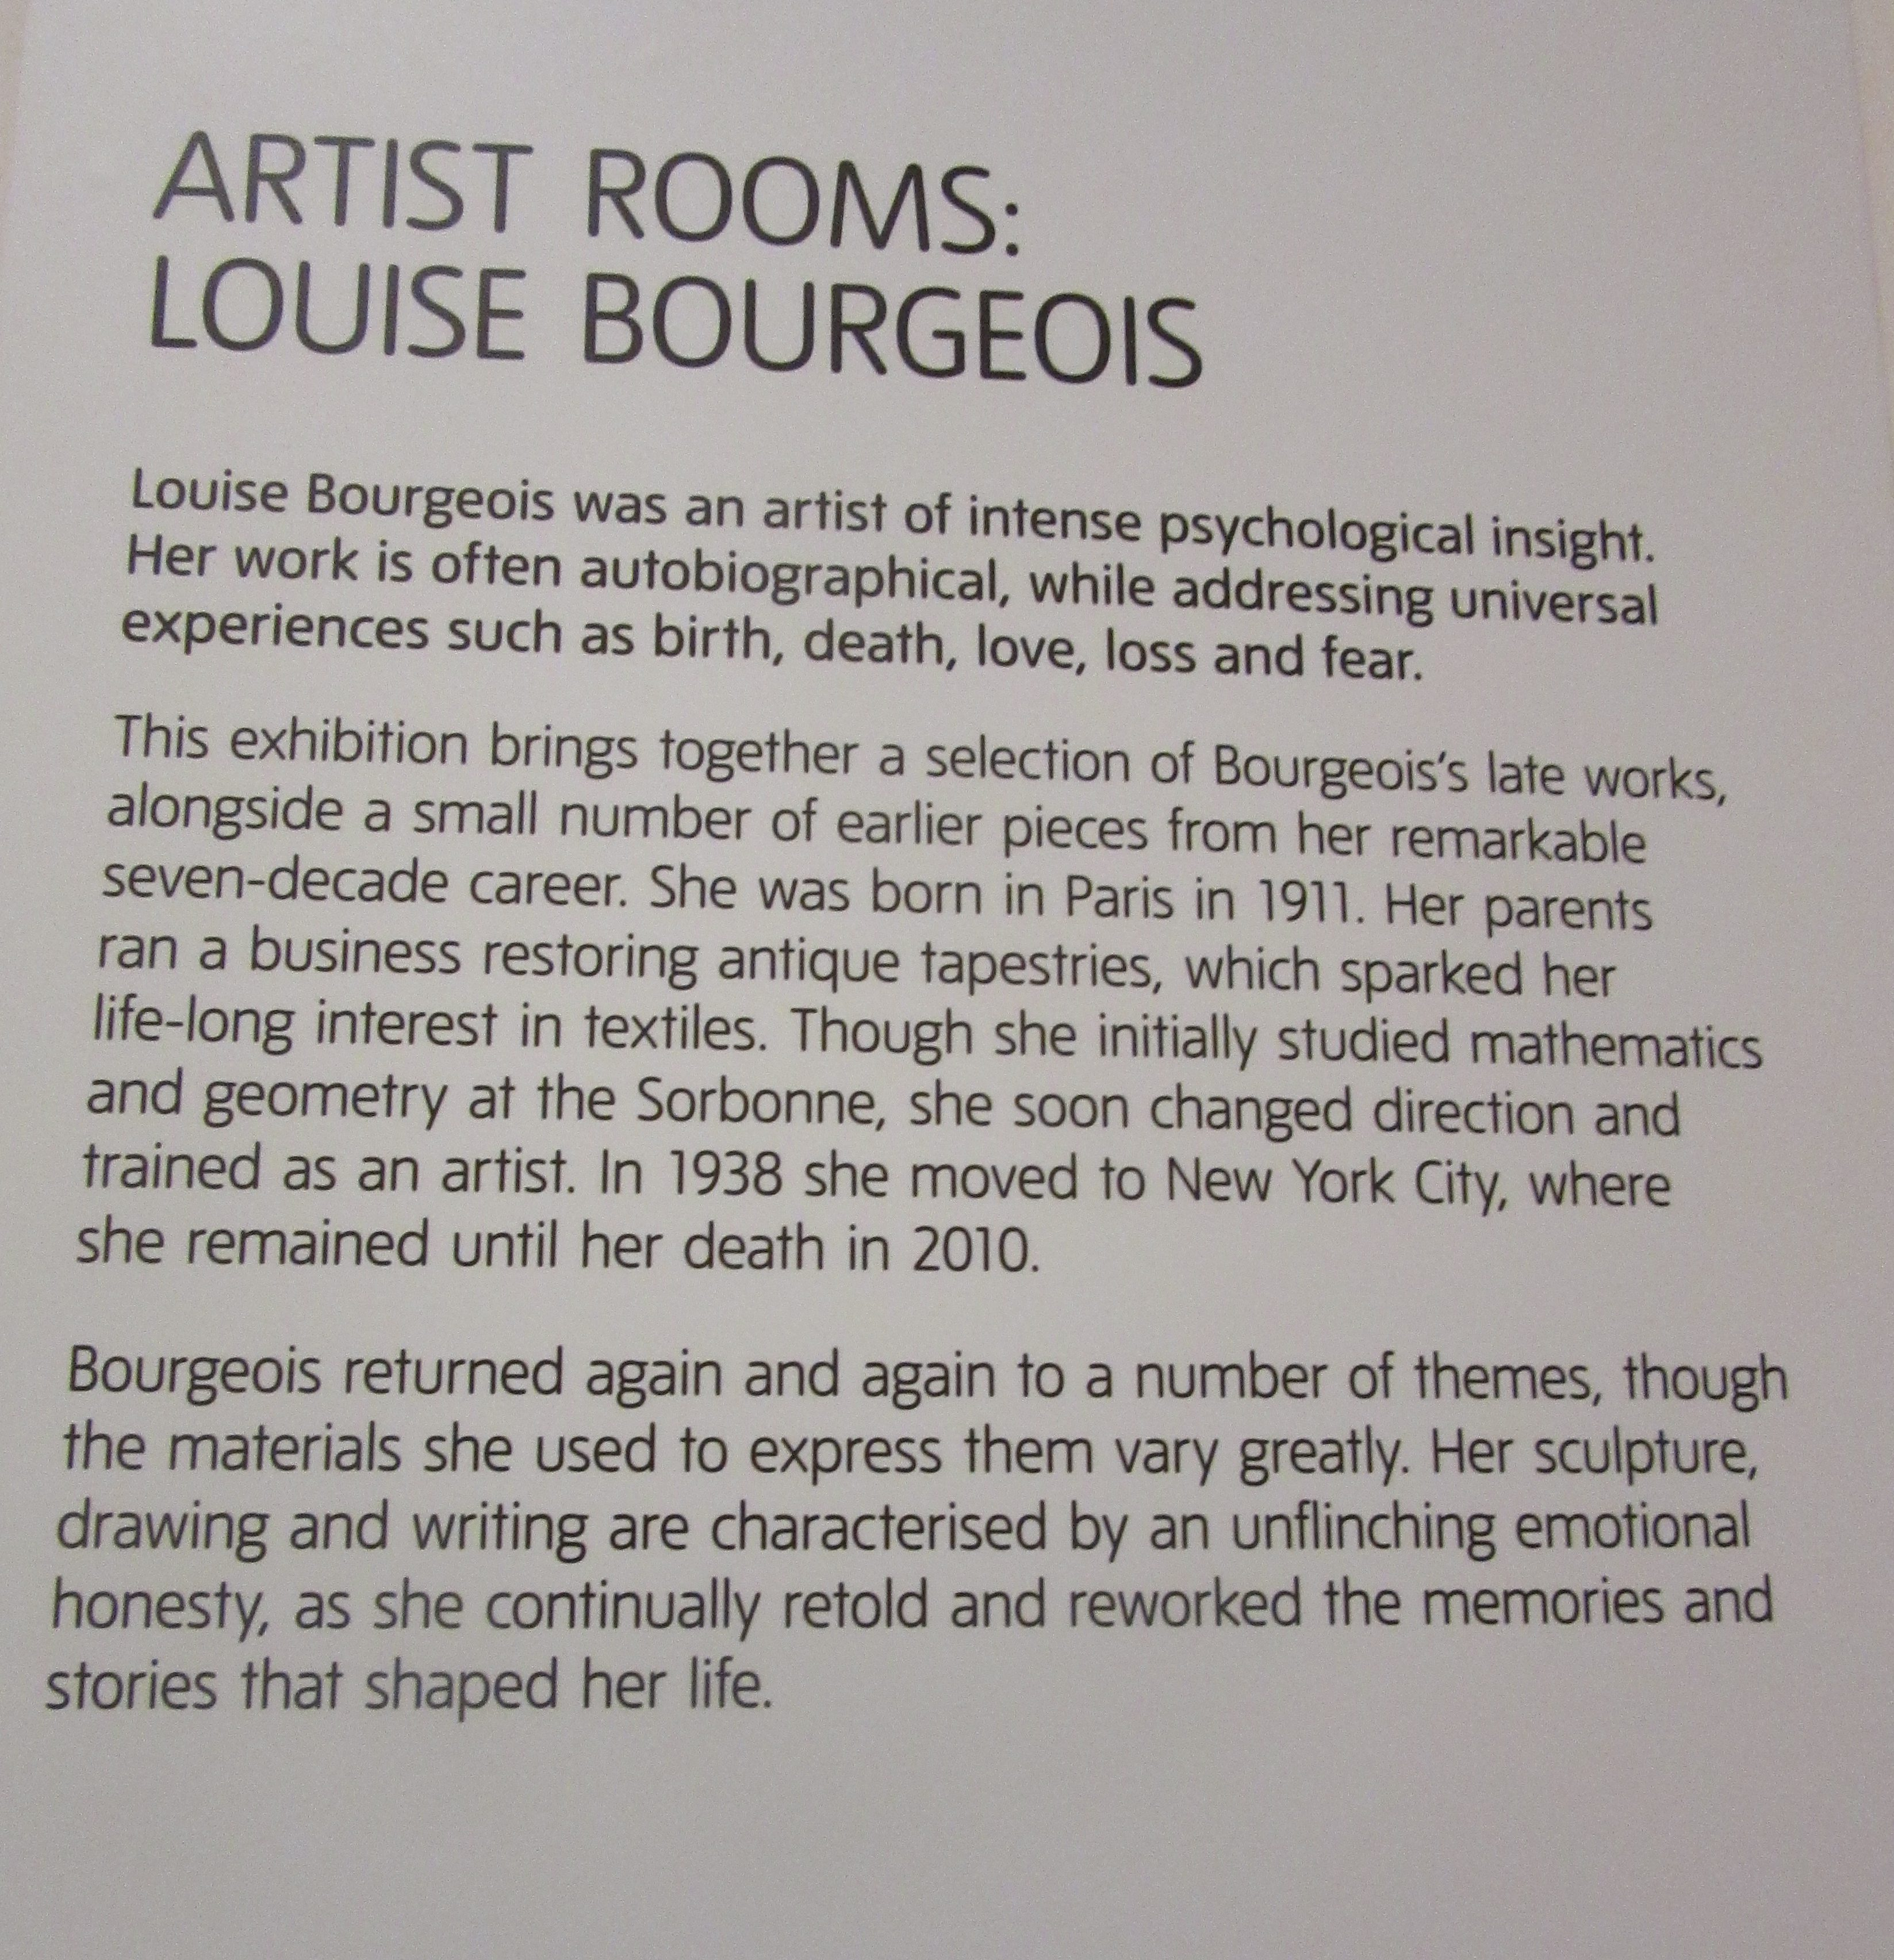 Tate modern. Artist Rooms. Louise Bourgeois